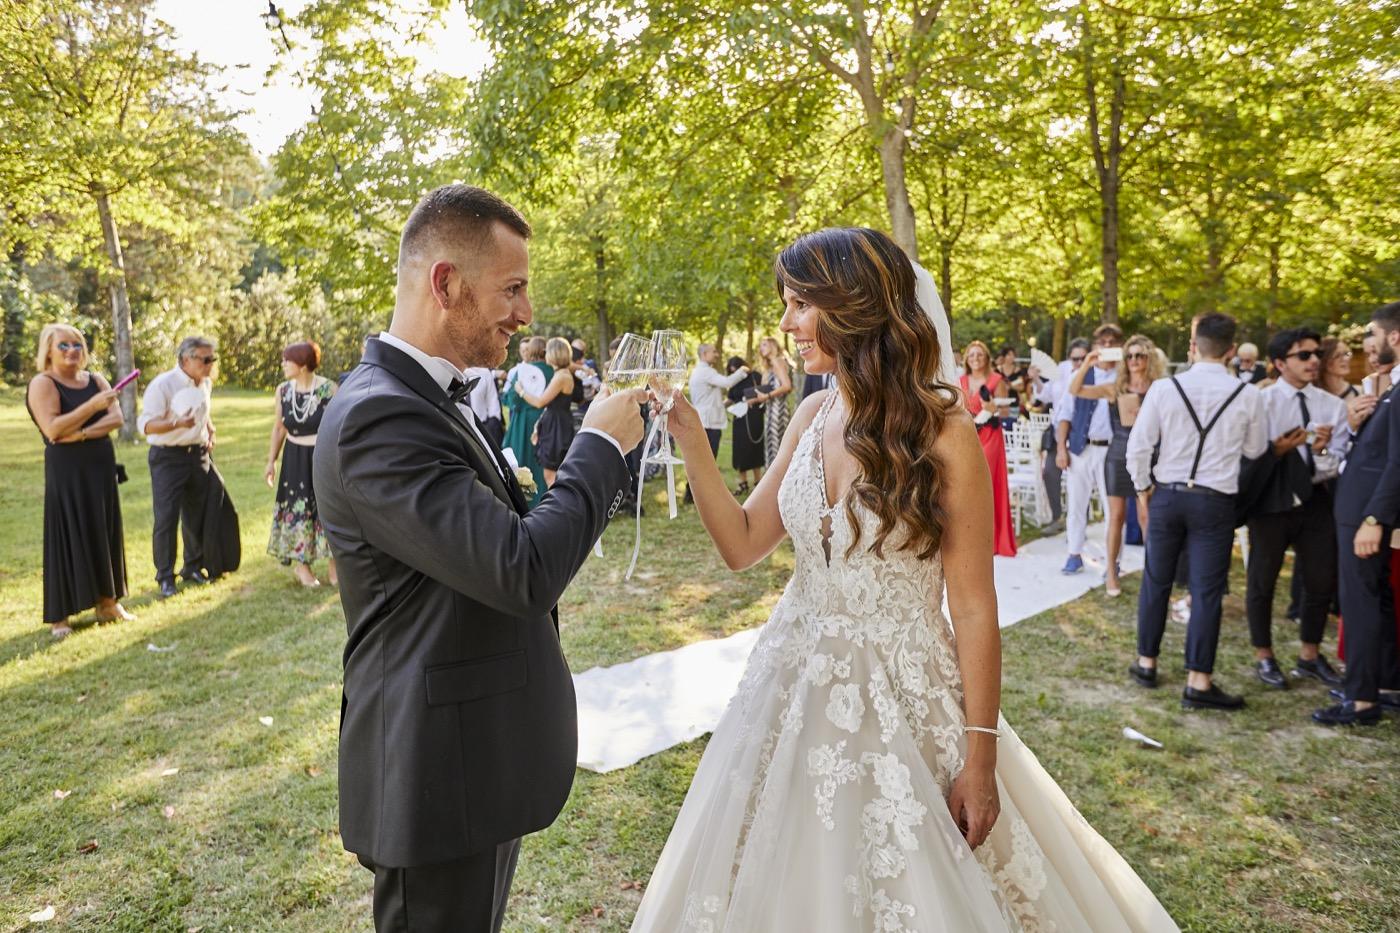 Claudio-Coppola-wedding-photographer-la-scuderia-eventi-preparativi-la-rosetta-perugia-65